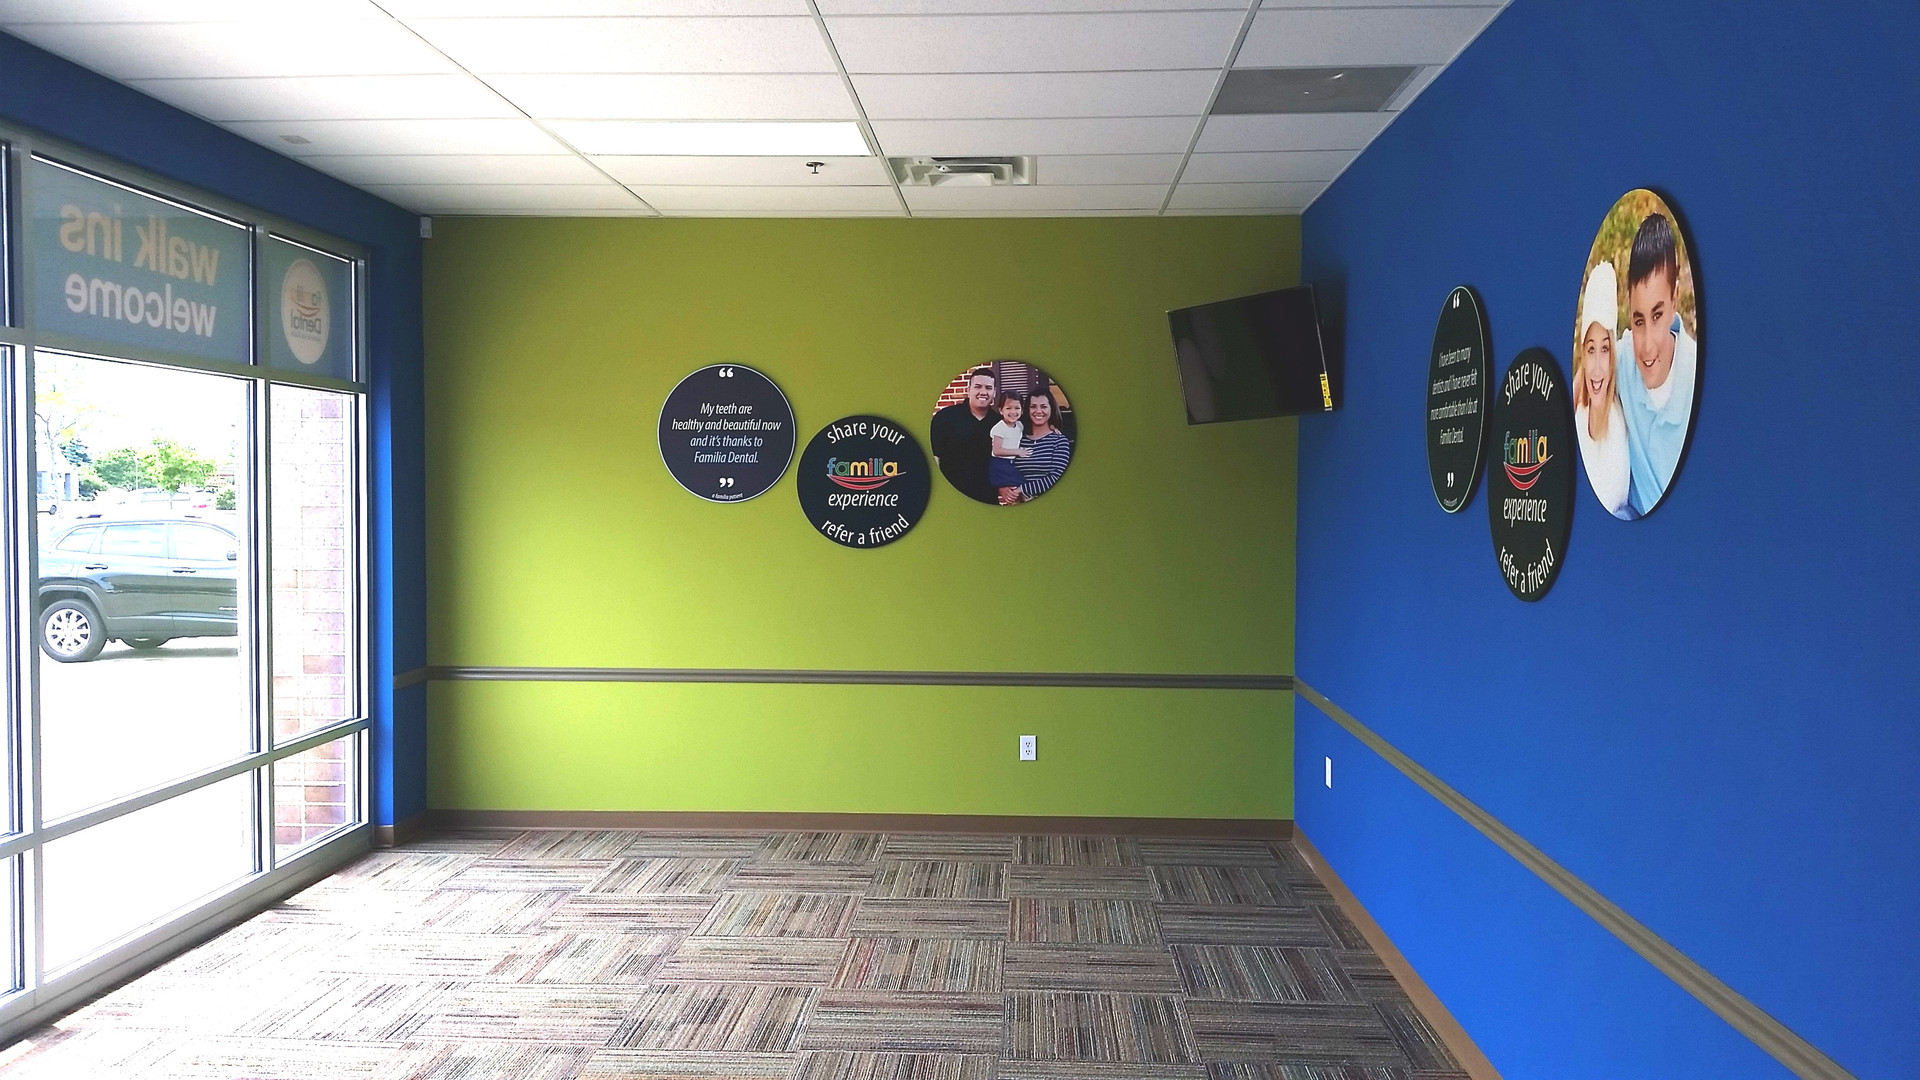 Green & Blue Walls - Buildout Pros